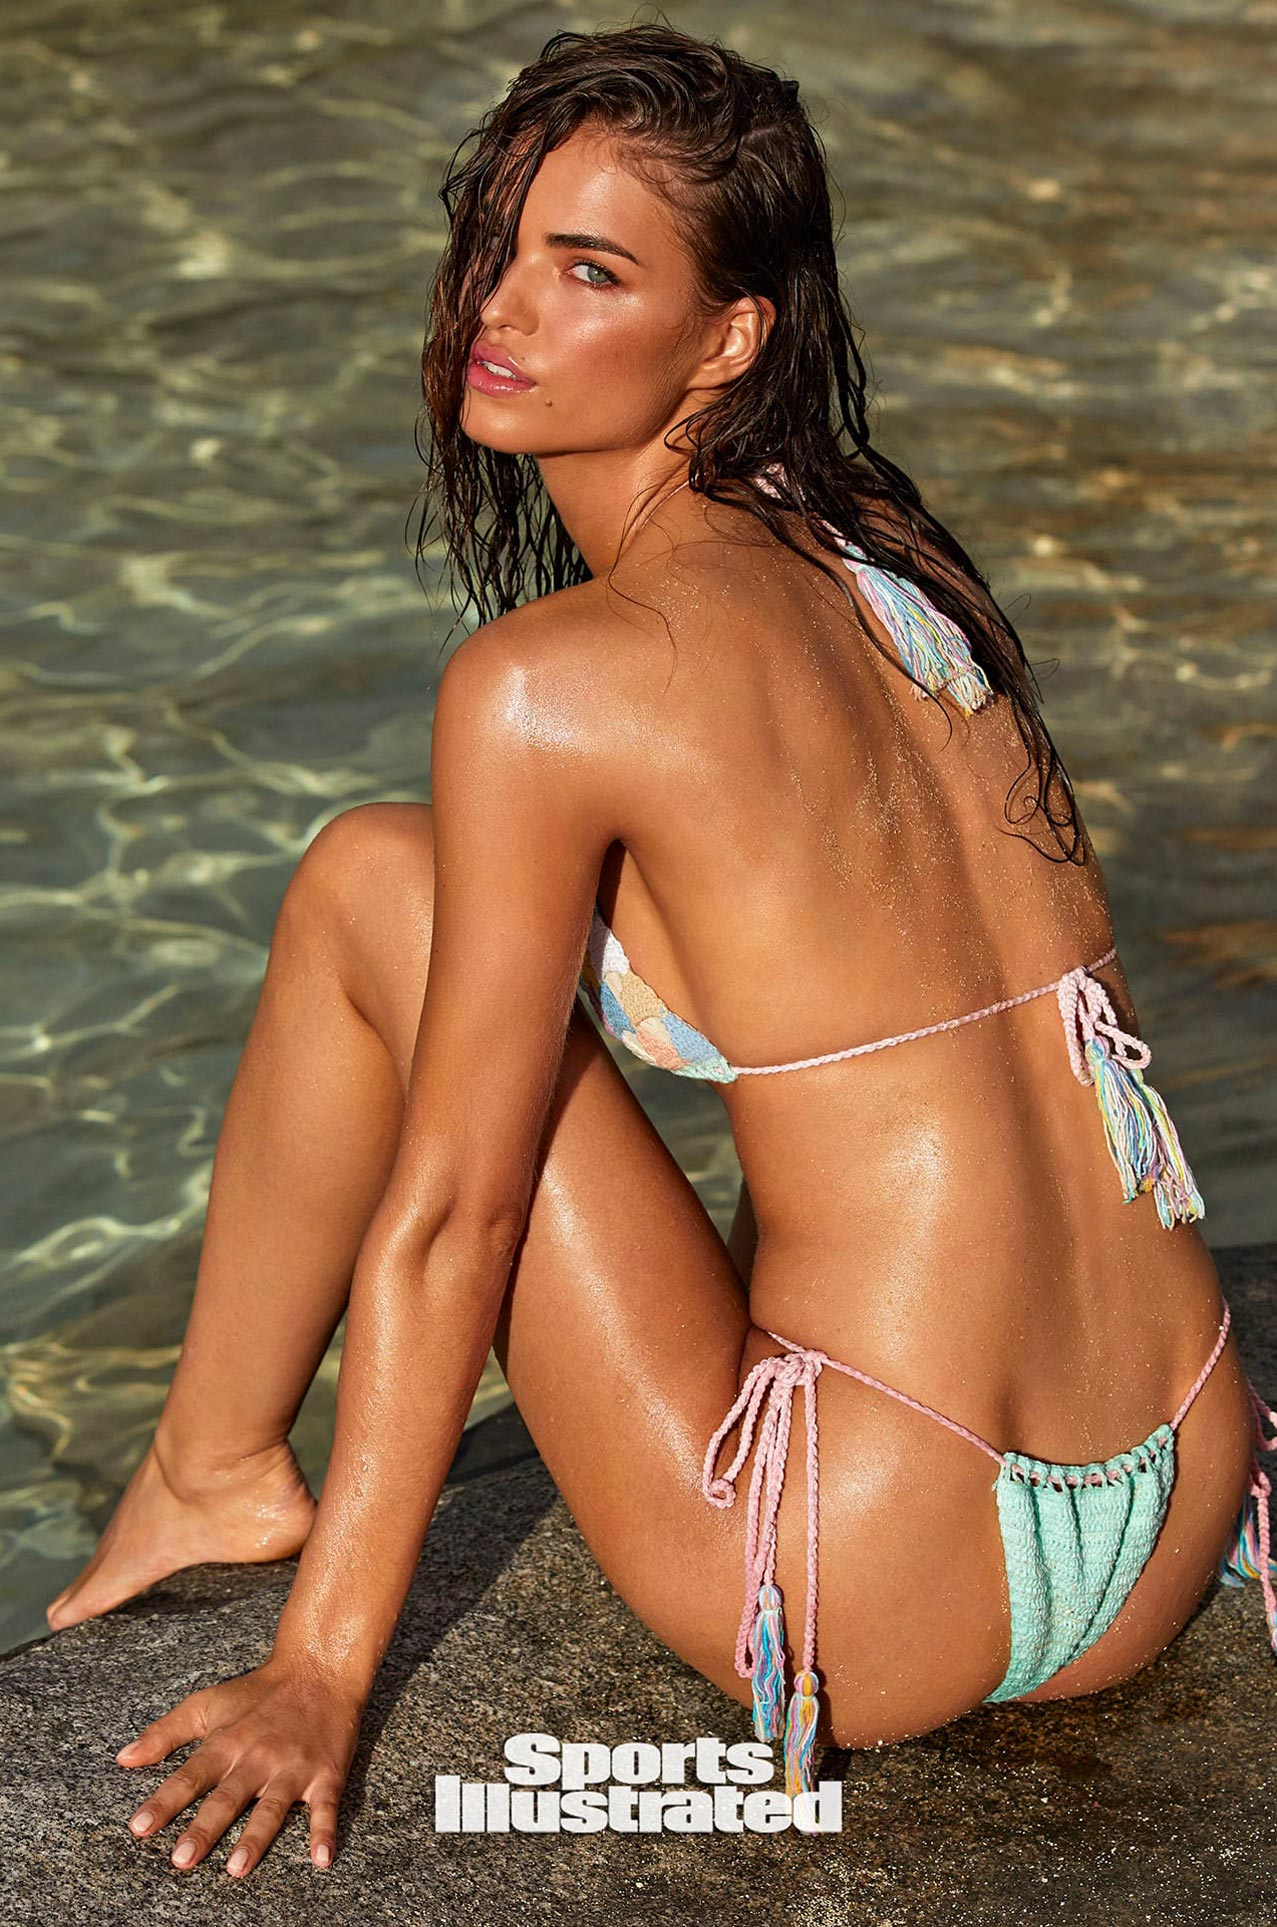 Робин Хольцкен в каталоге купальников Sports Illustrated Swimsuit 2020 / фото 09